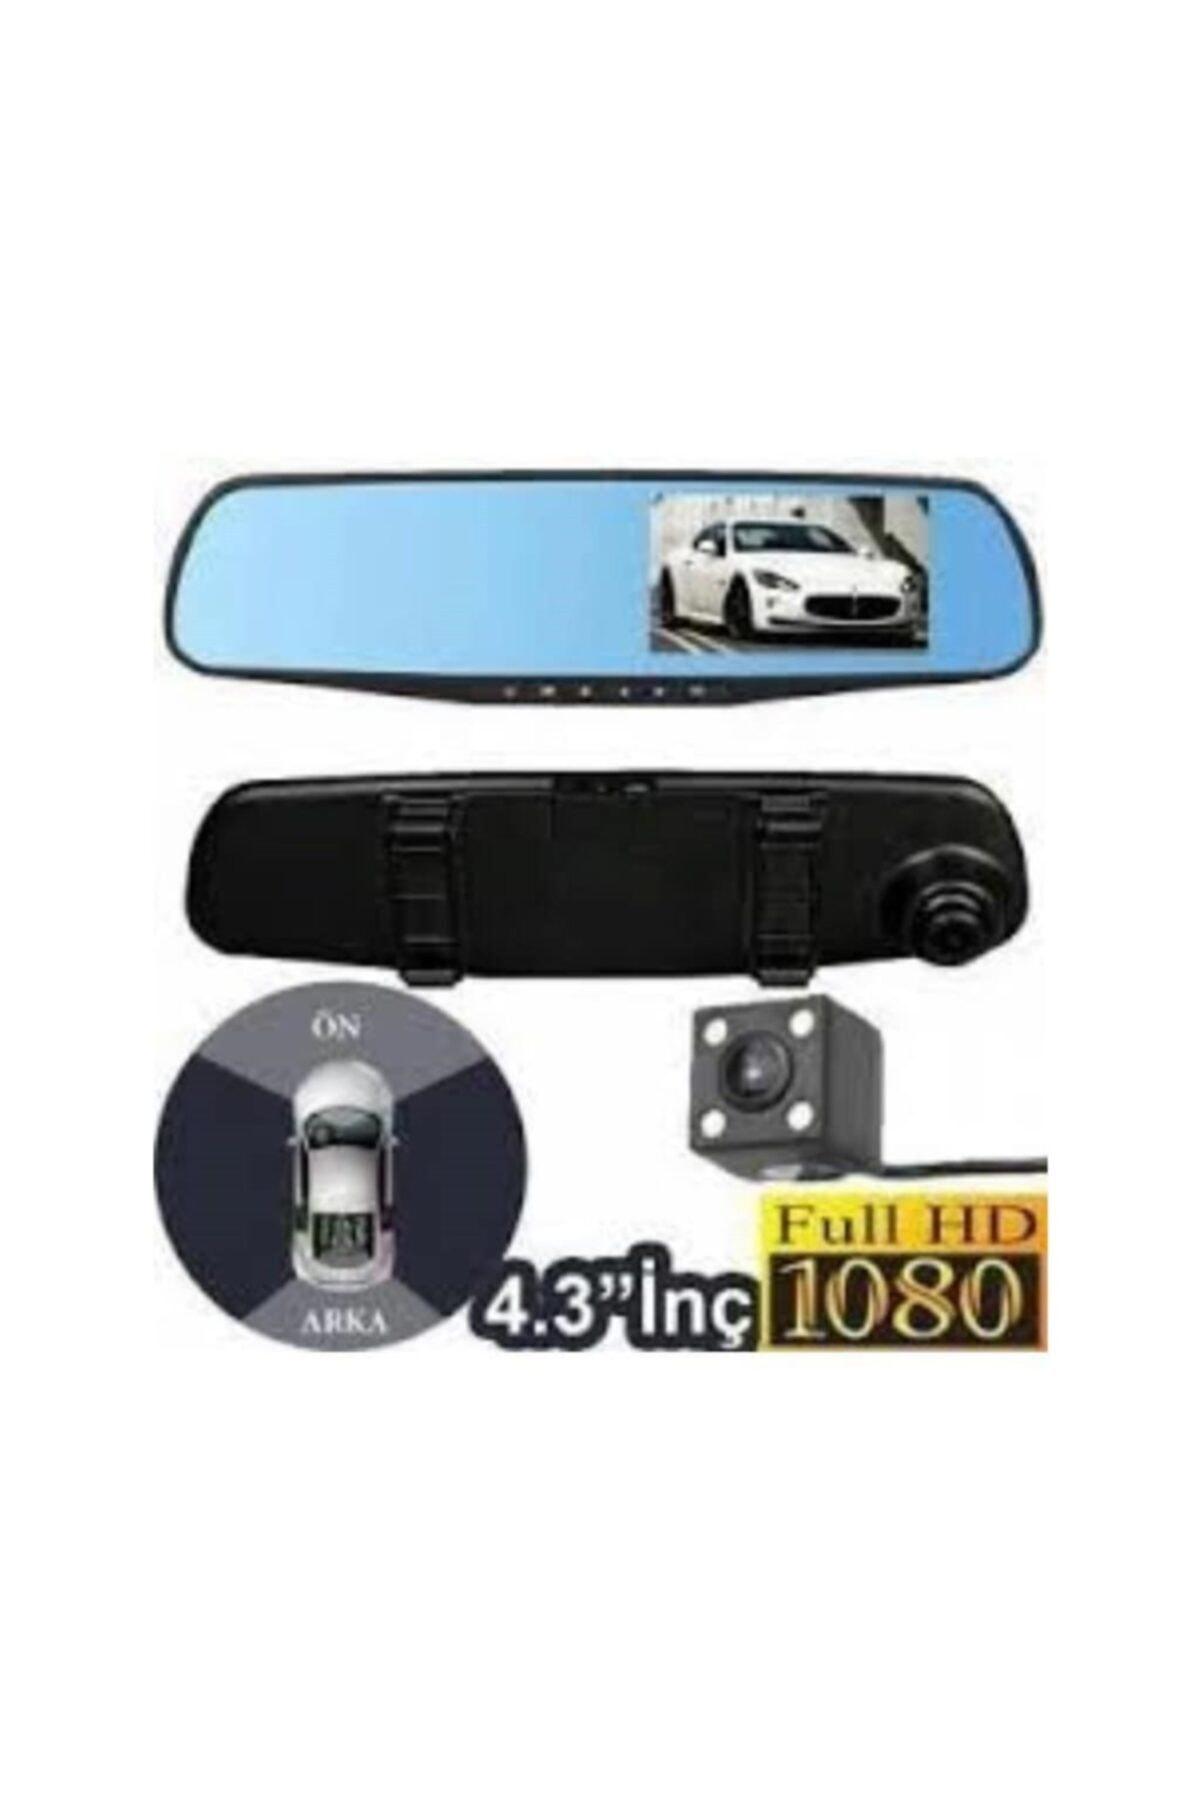 Piranha Kamera Full Hd 3.5 Inç Araç Içi Yol Kayıt Kamerası 1